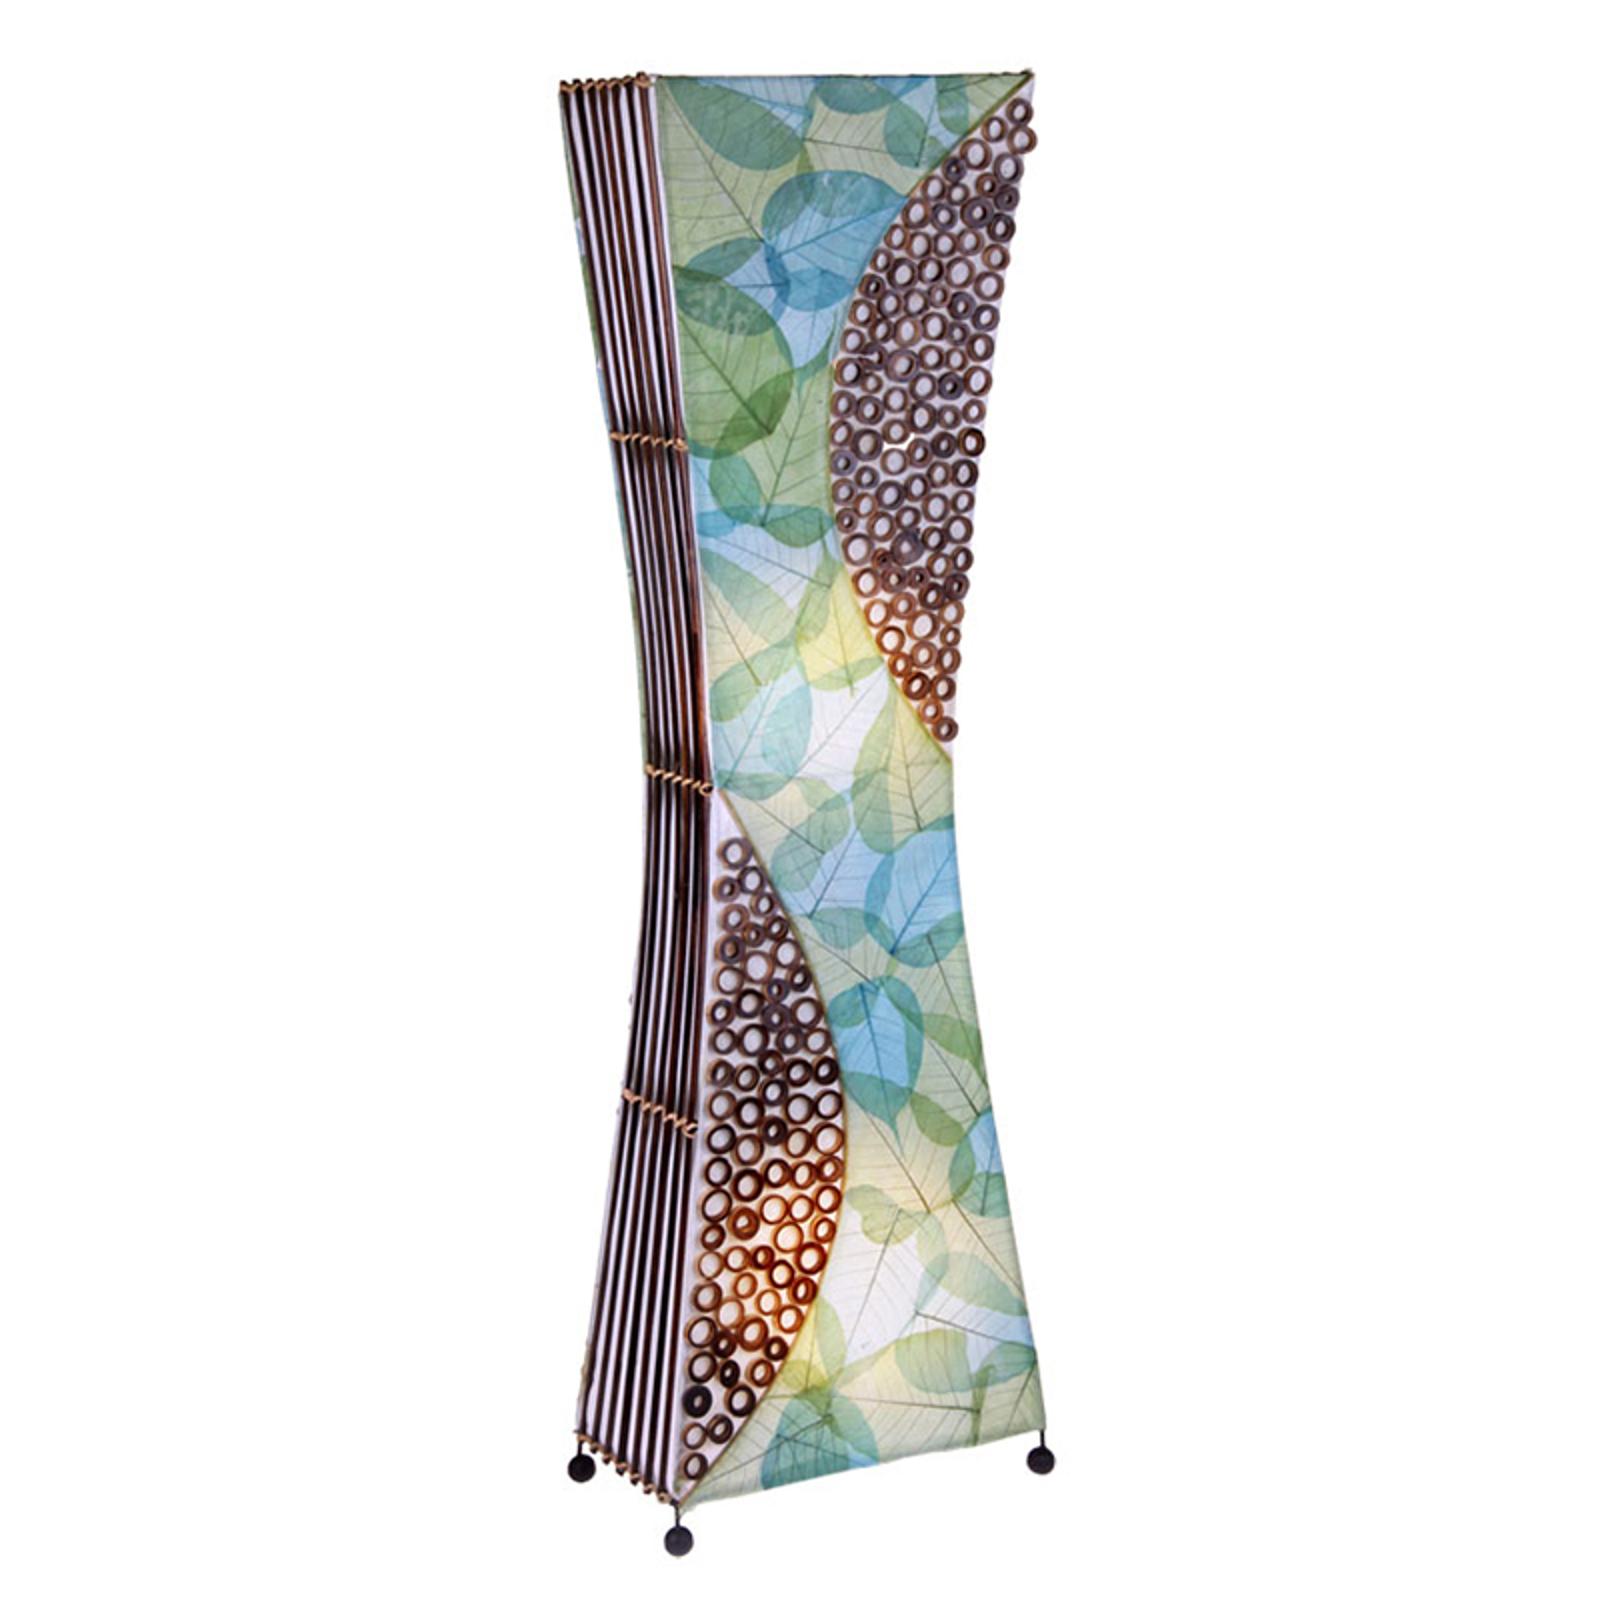 Vloerlamp Talia met natuurmateriaal, 100 cm